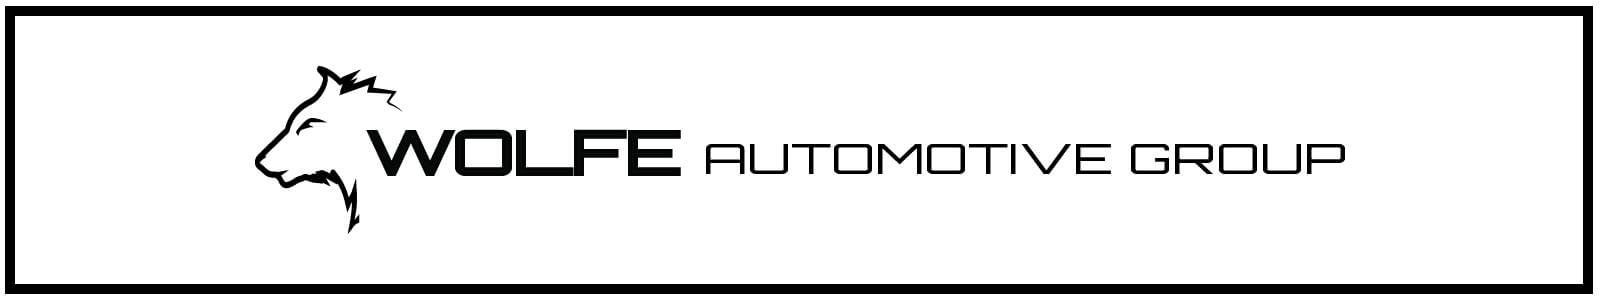 Wolfe Automotive Group